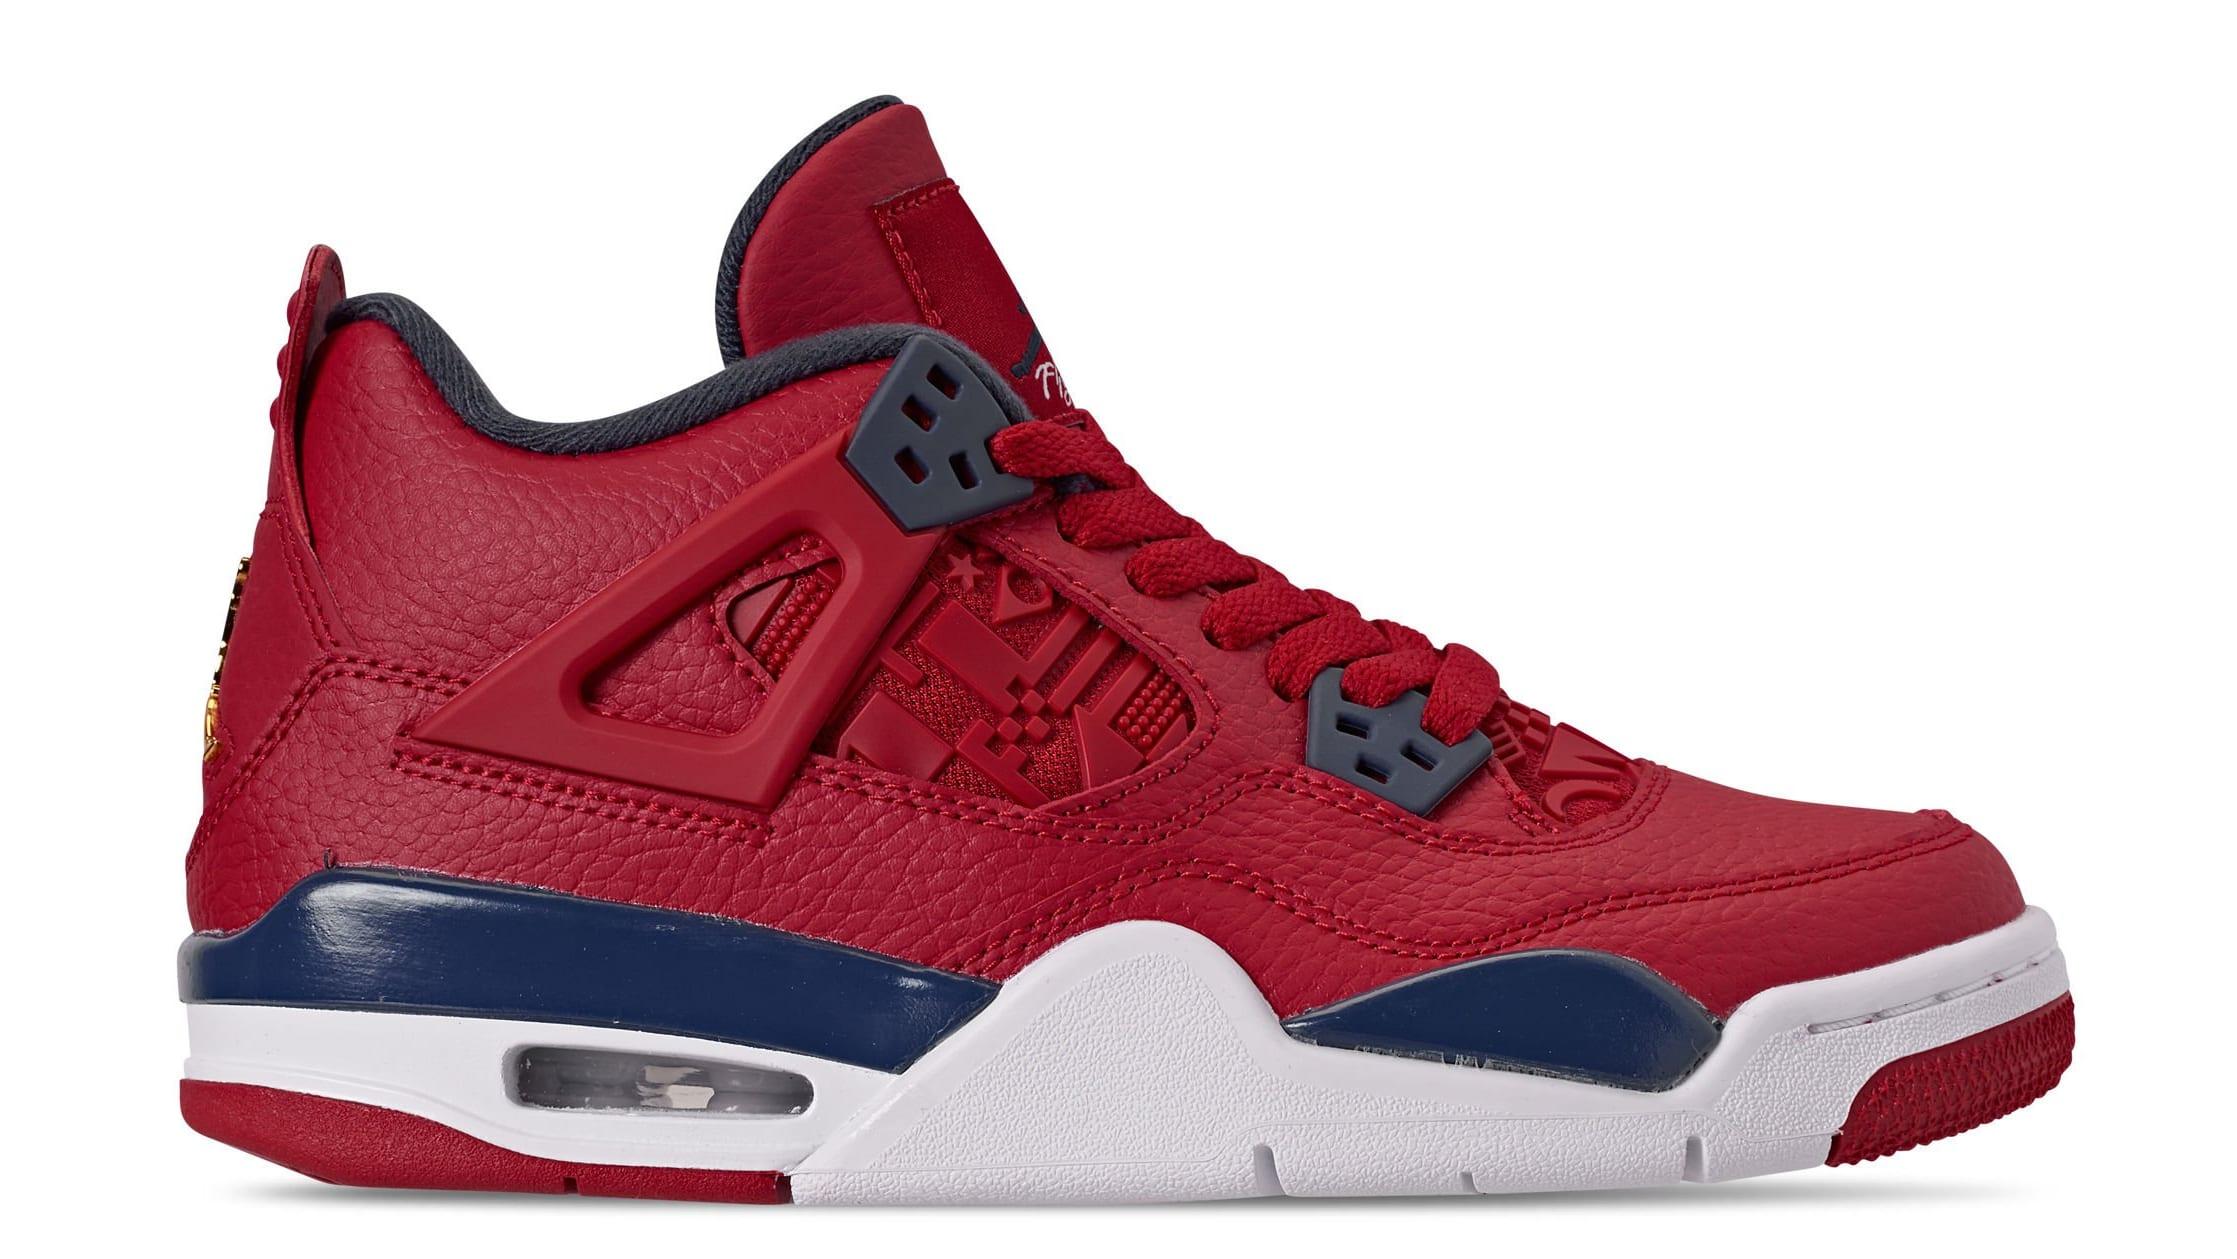 Air Jordan 4 Retro SE 'Fiba' Release